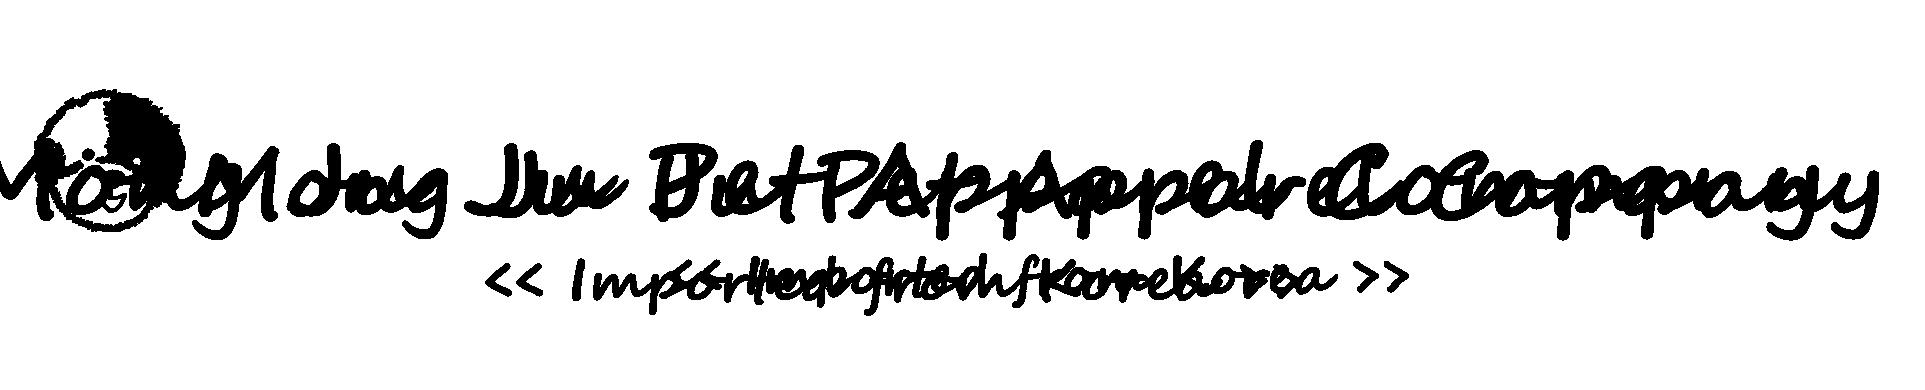 e5fbc6f56eb5be364c5cb67b8c75f7fc